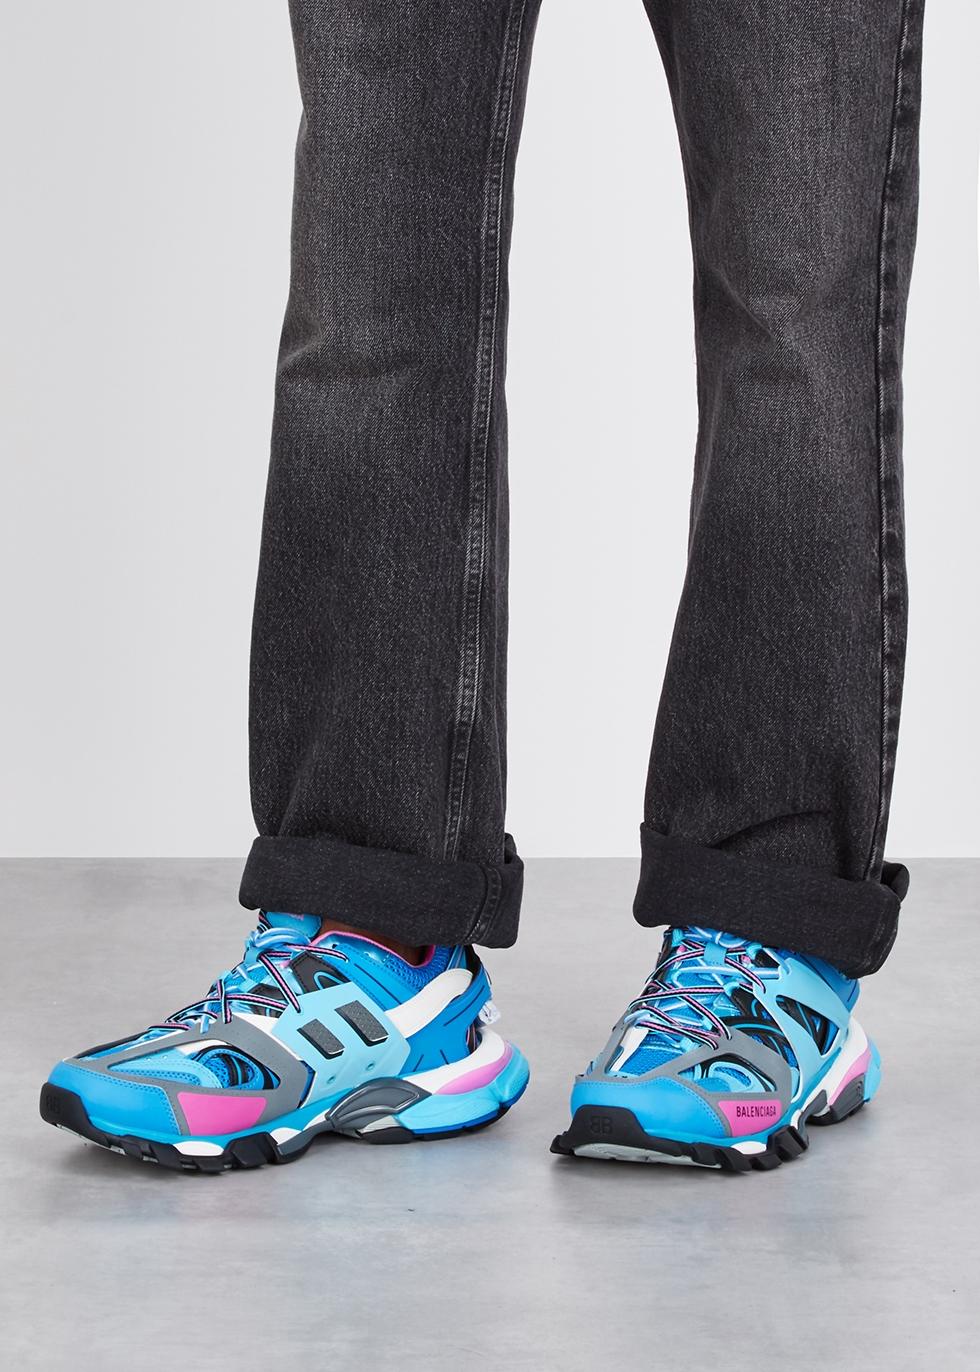 All The Balenciaga Track Sneakers On Feet {Miami